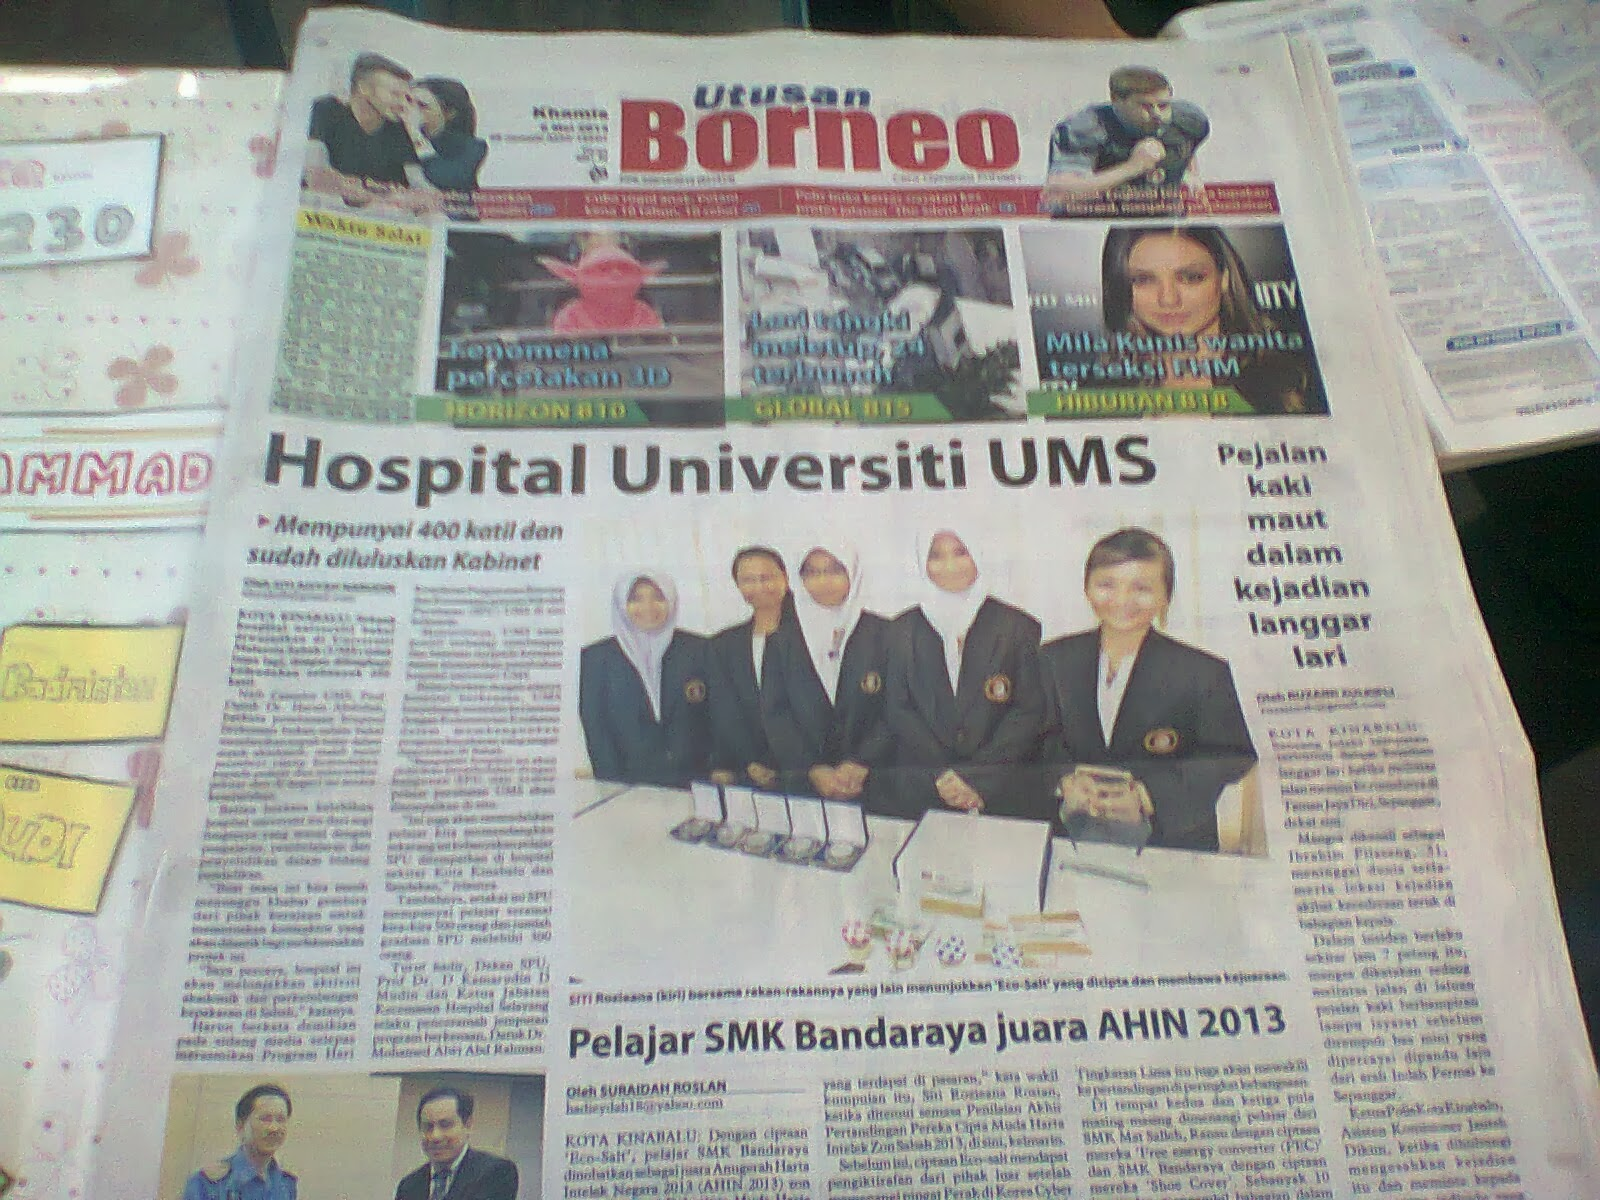 Utusan Borneo edisi 9 Mei 2013